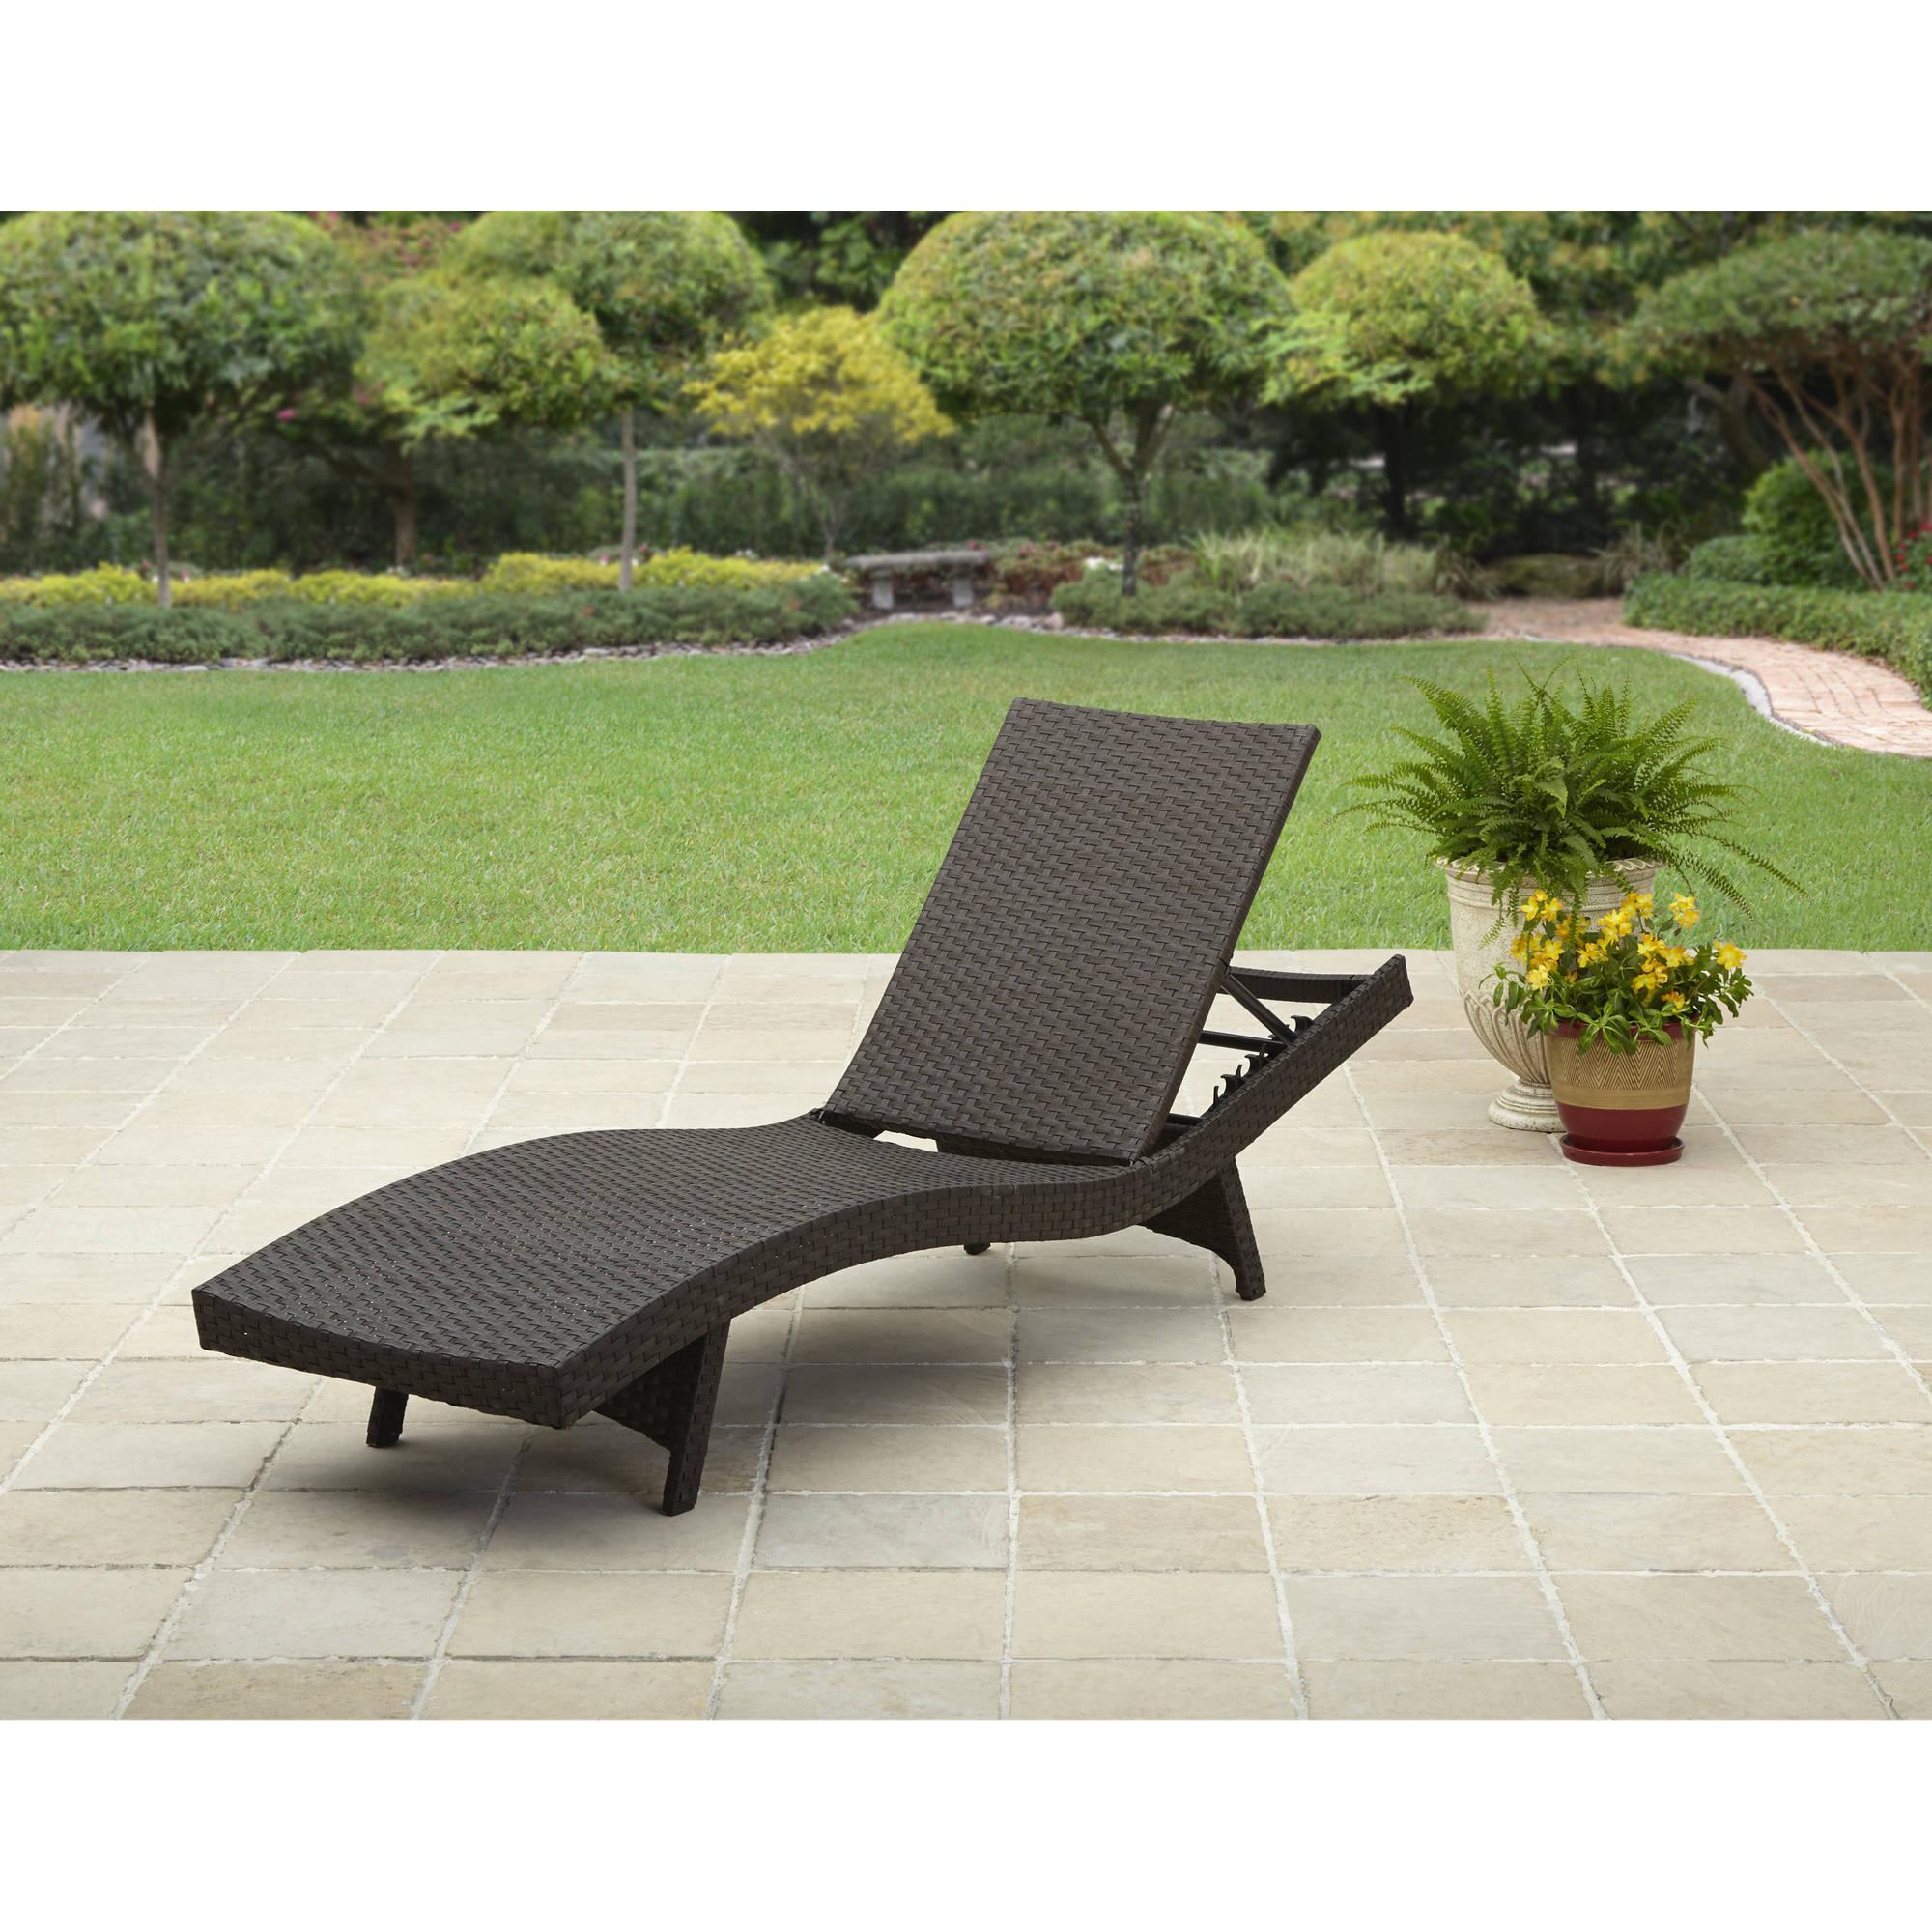 lawn furniture patio furniture - walmart.com UCZBYRC